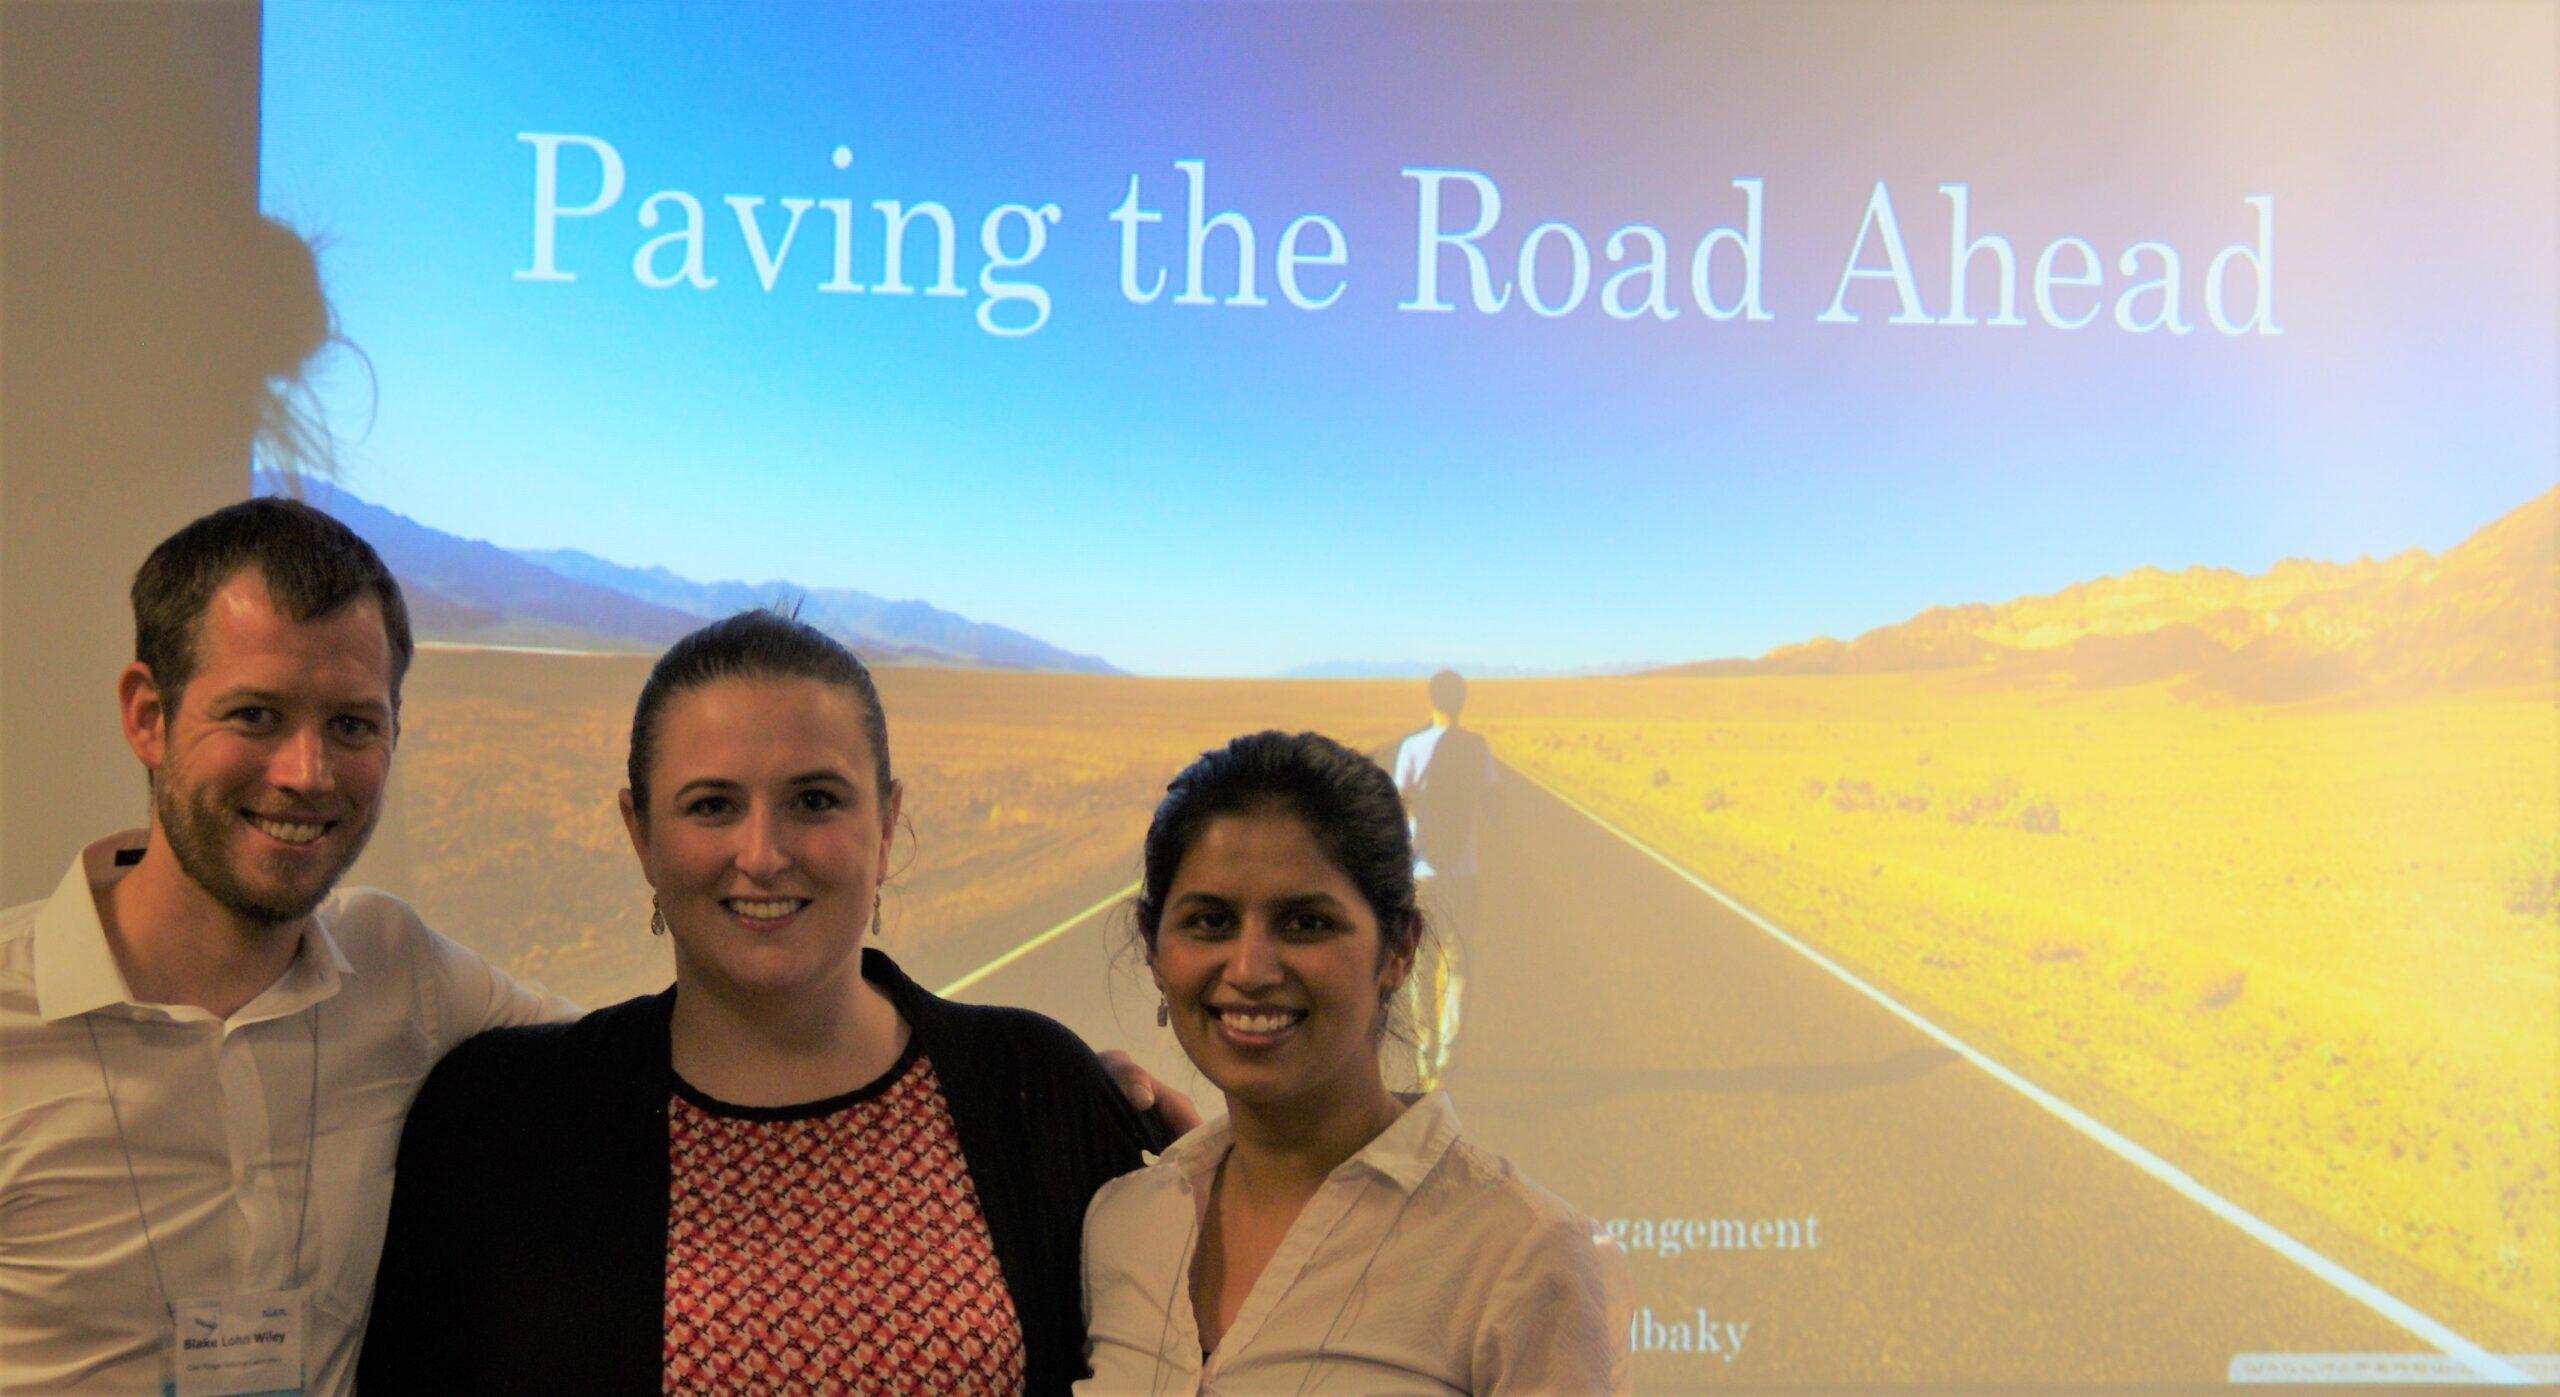 Paving the Road Ahead Workshop